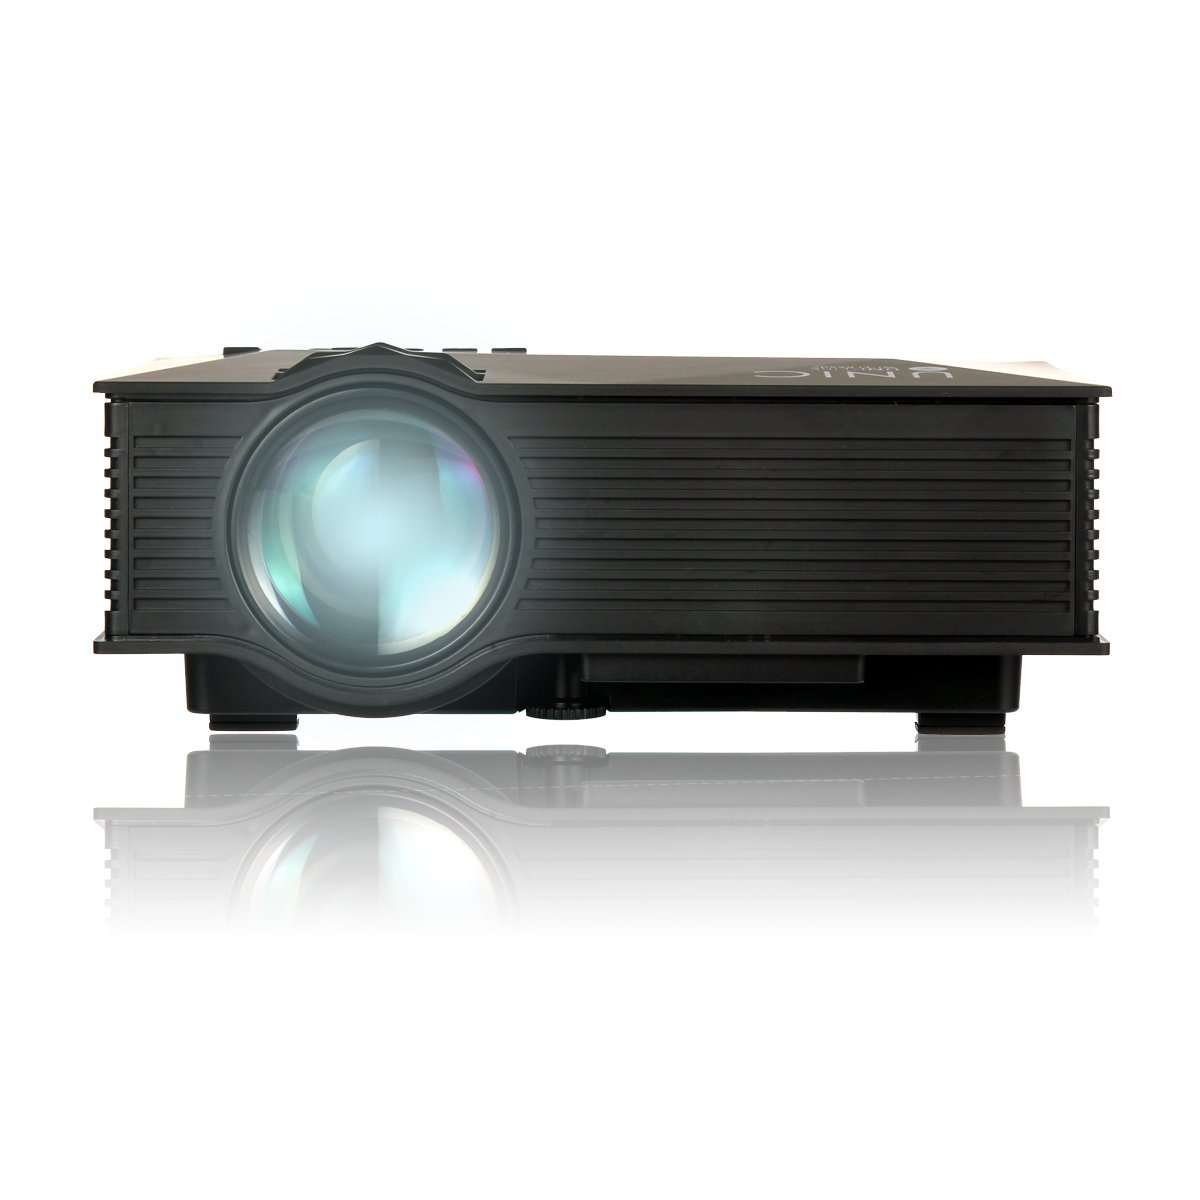 Uvistar Wireless Home Cinema Multimedia Projector Mini Portable LCD LED Projection with USB/SD/AV/HDMI/VGA Support 1080p 1000+ Lumens IP/IR/USB/SD/HDMI/VGA